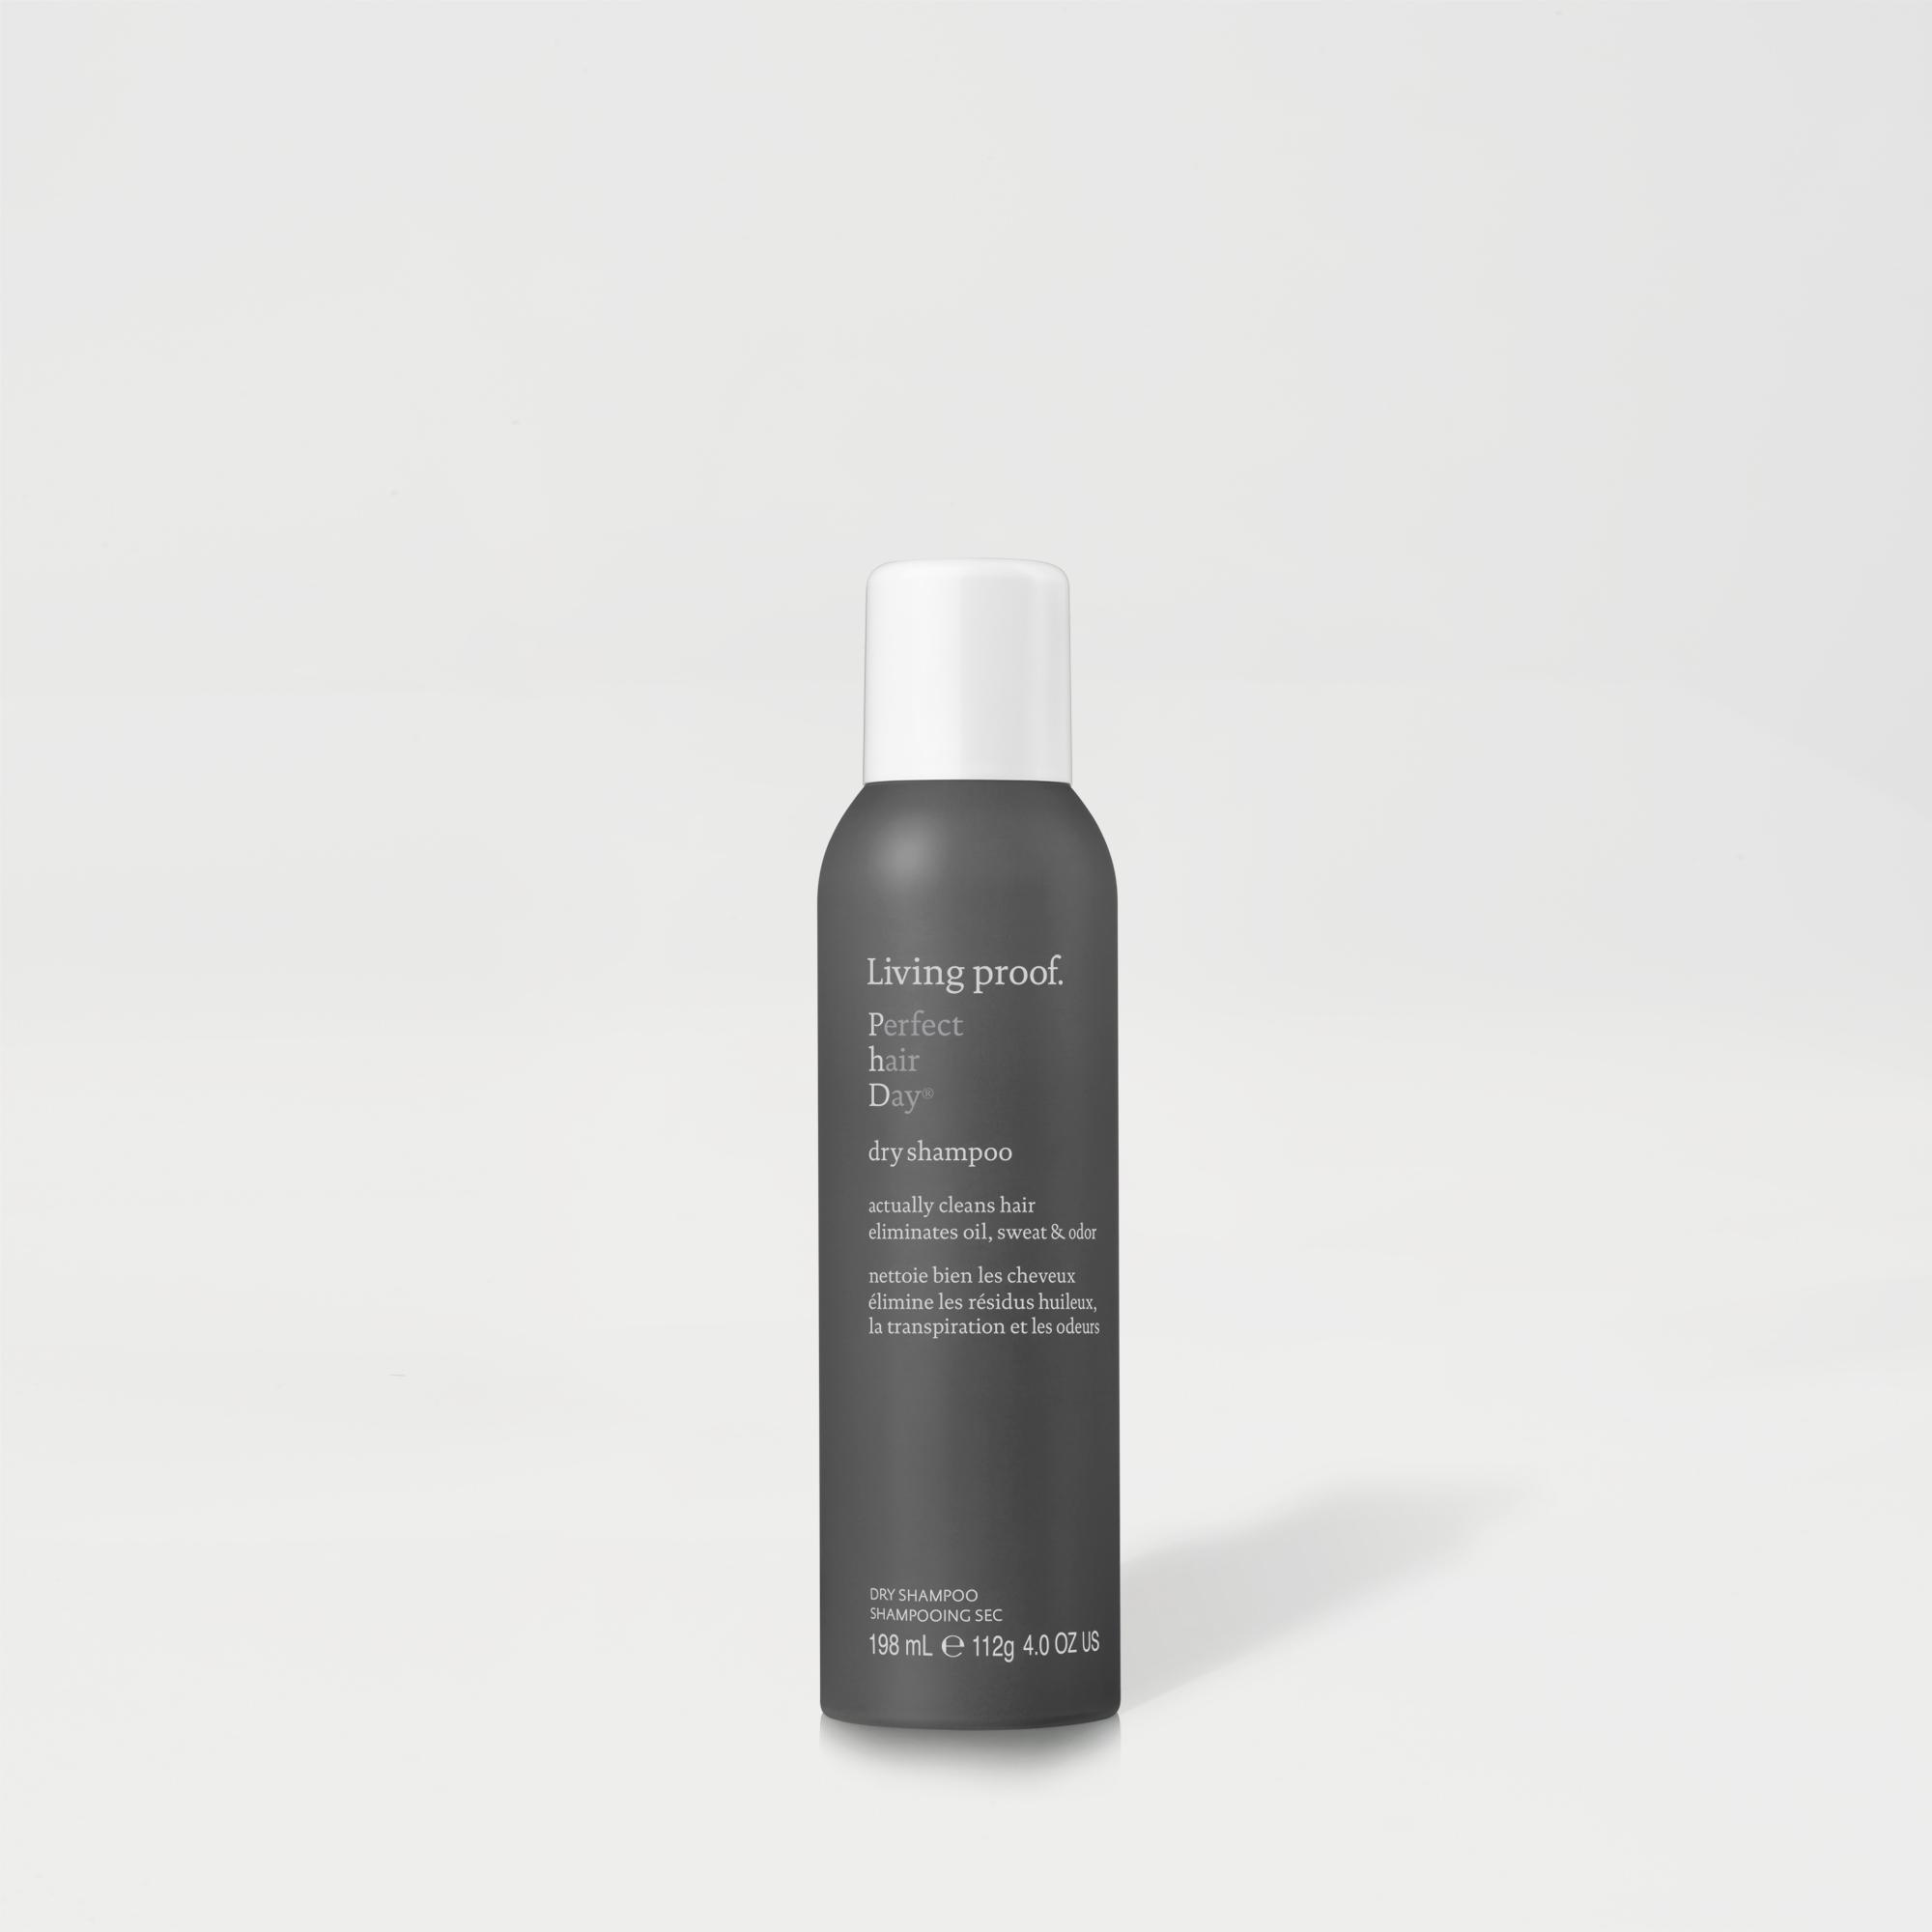 Living Proof Perfect Hair Day Dry Shampoo Bundle Best Dry shampoo